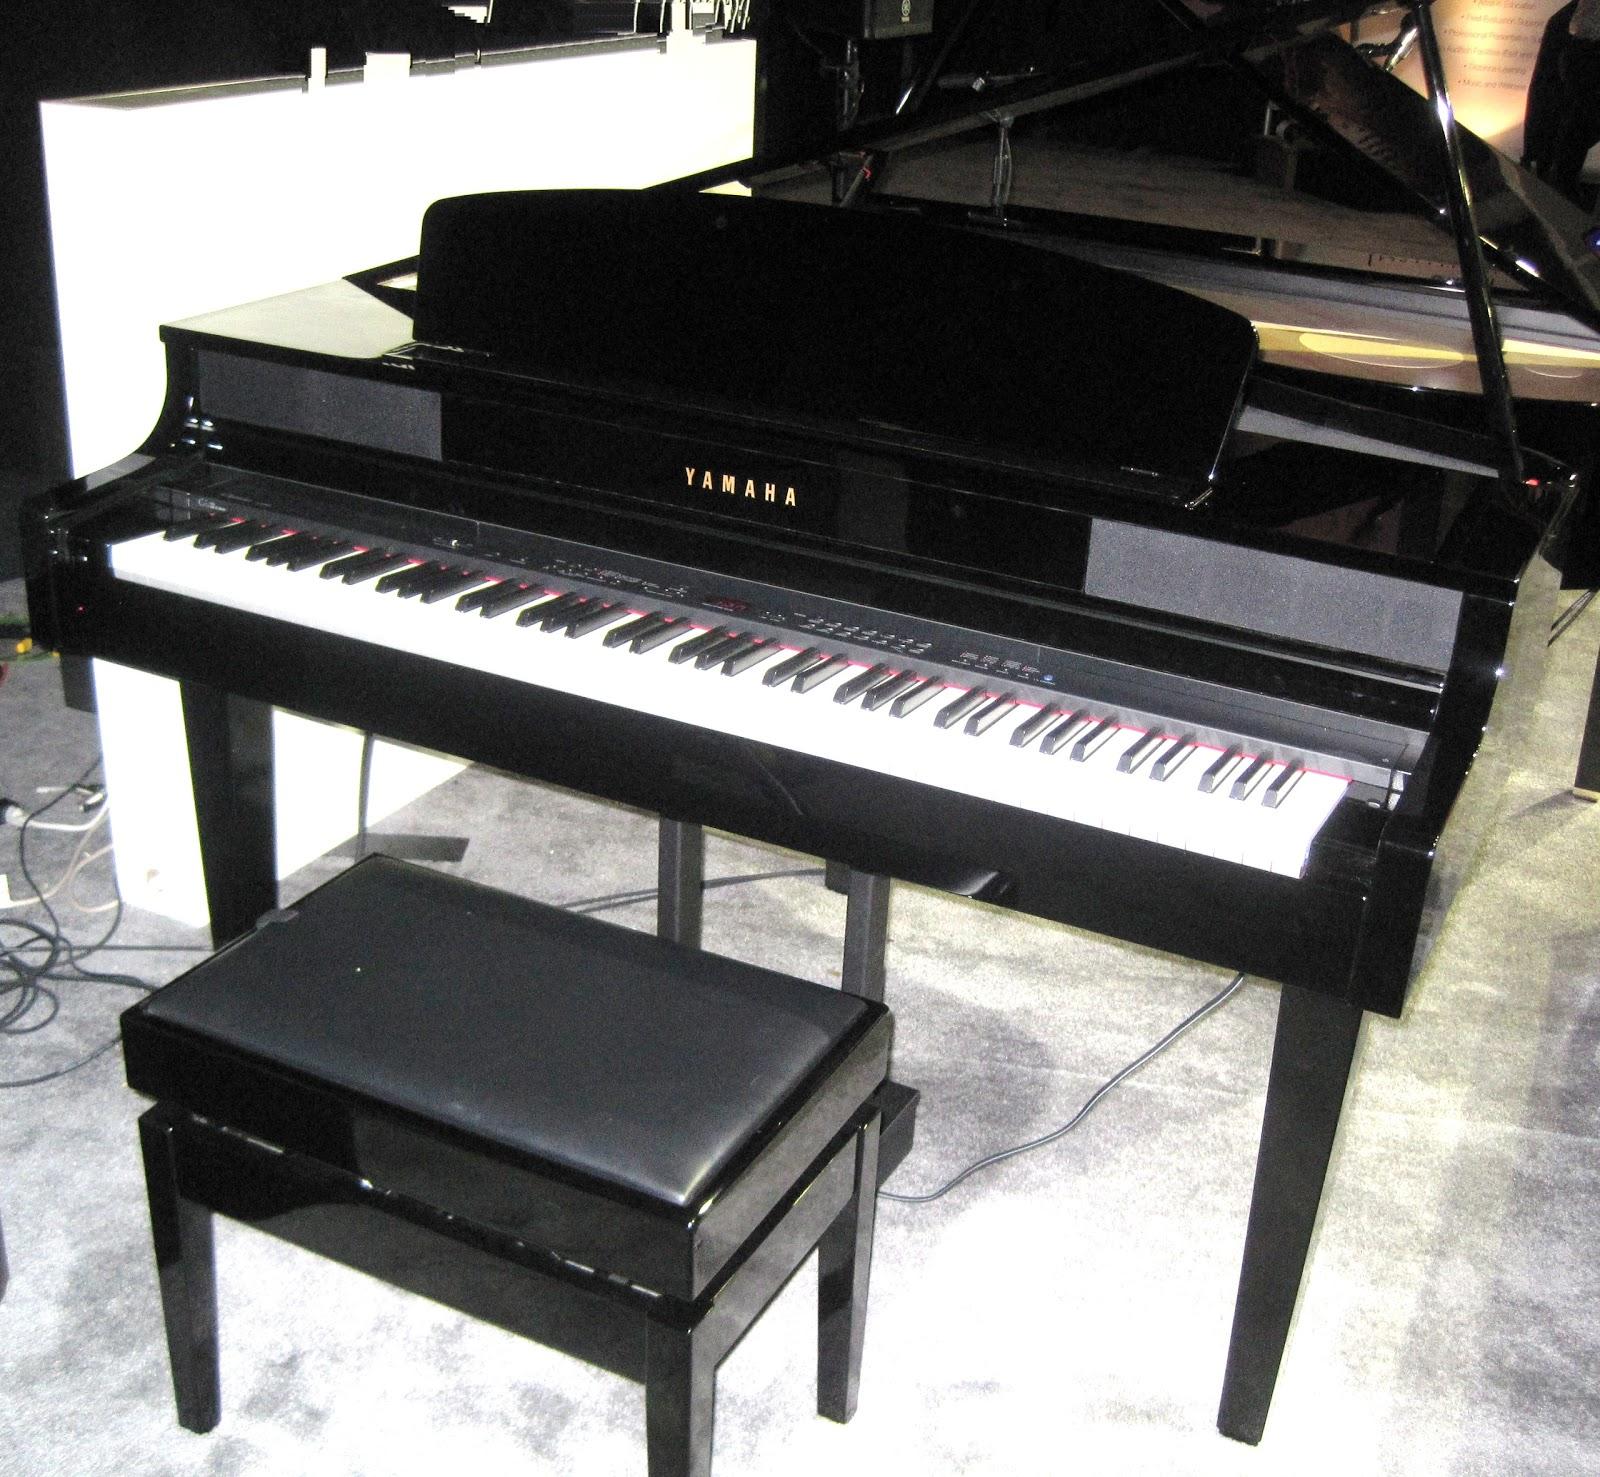 simple piano keyboard yamaha digital pianos bournemouth university best digital piano keyboard. Black Bedroom Furniture Sets. Home Design Ideas